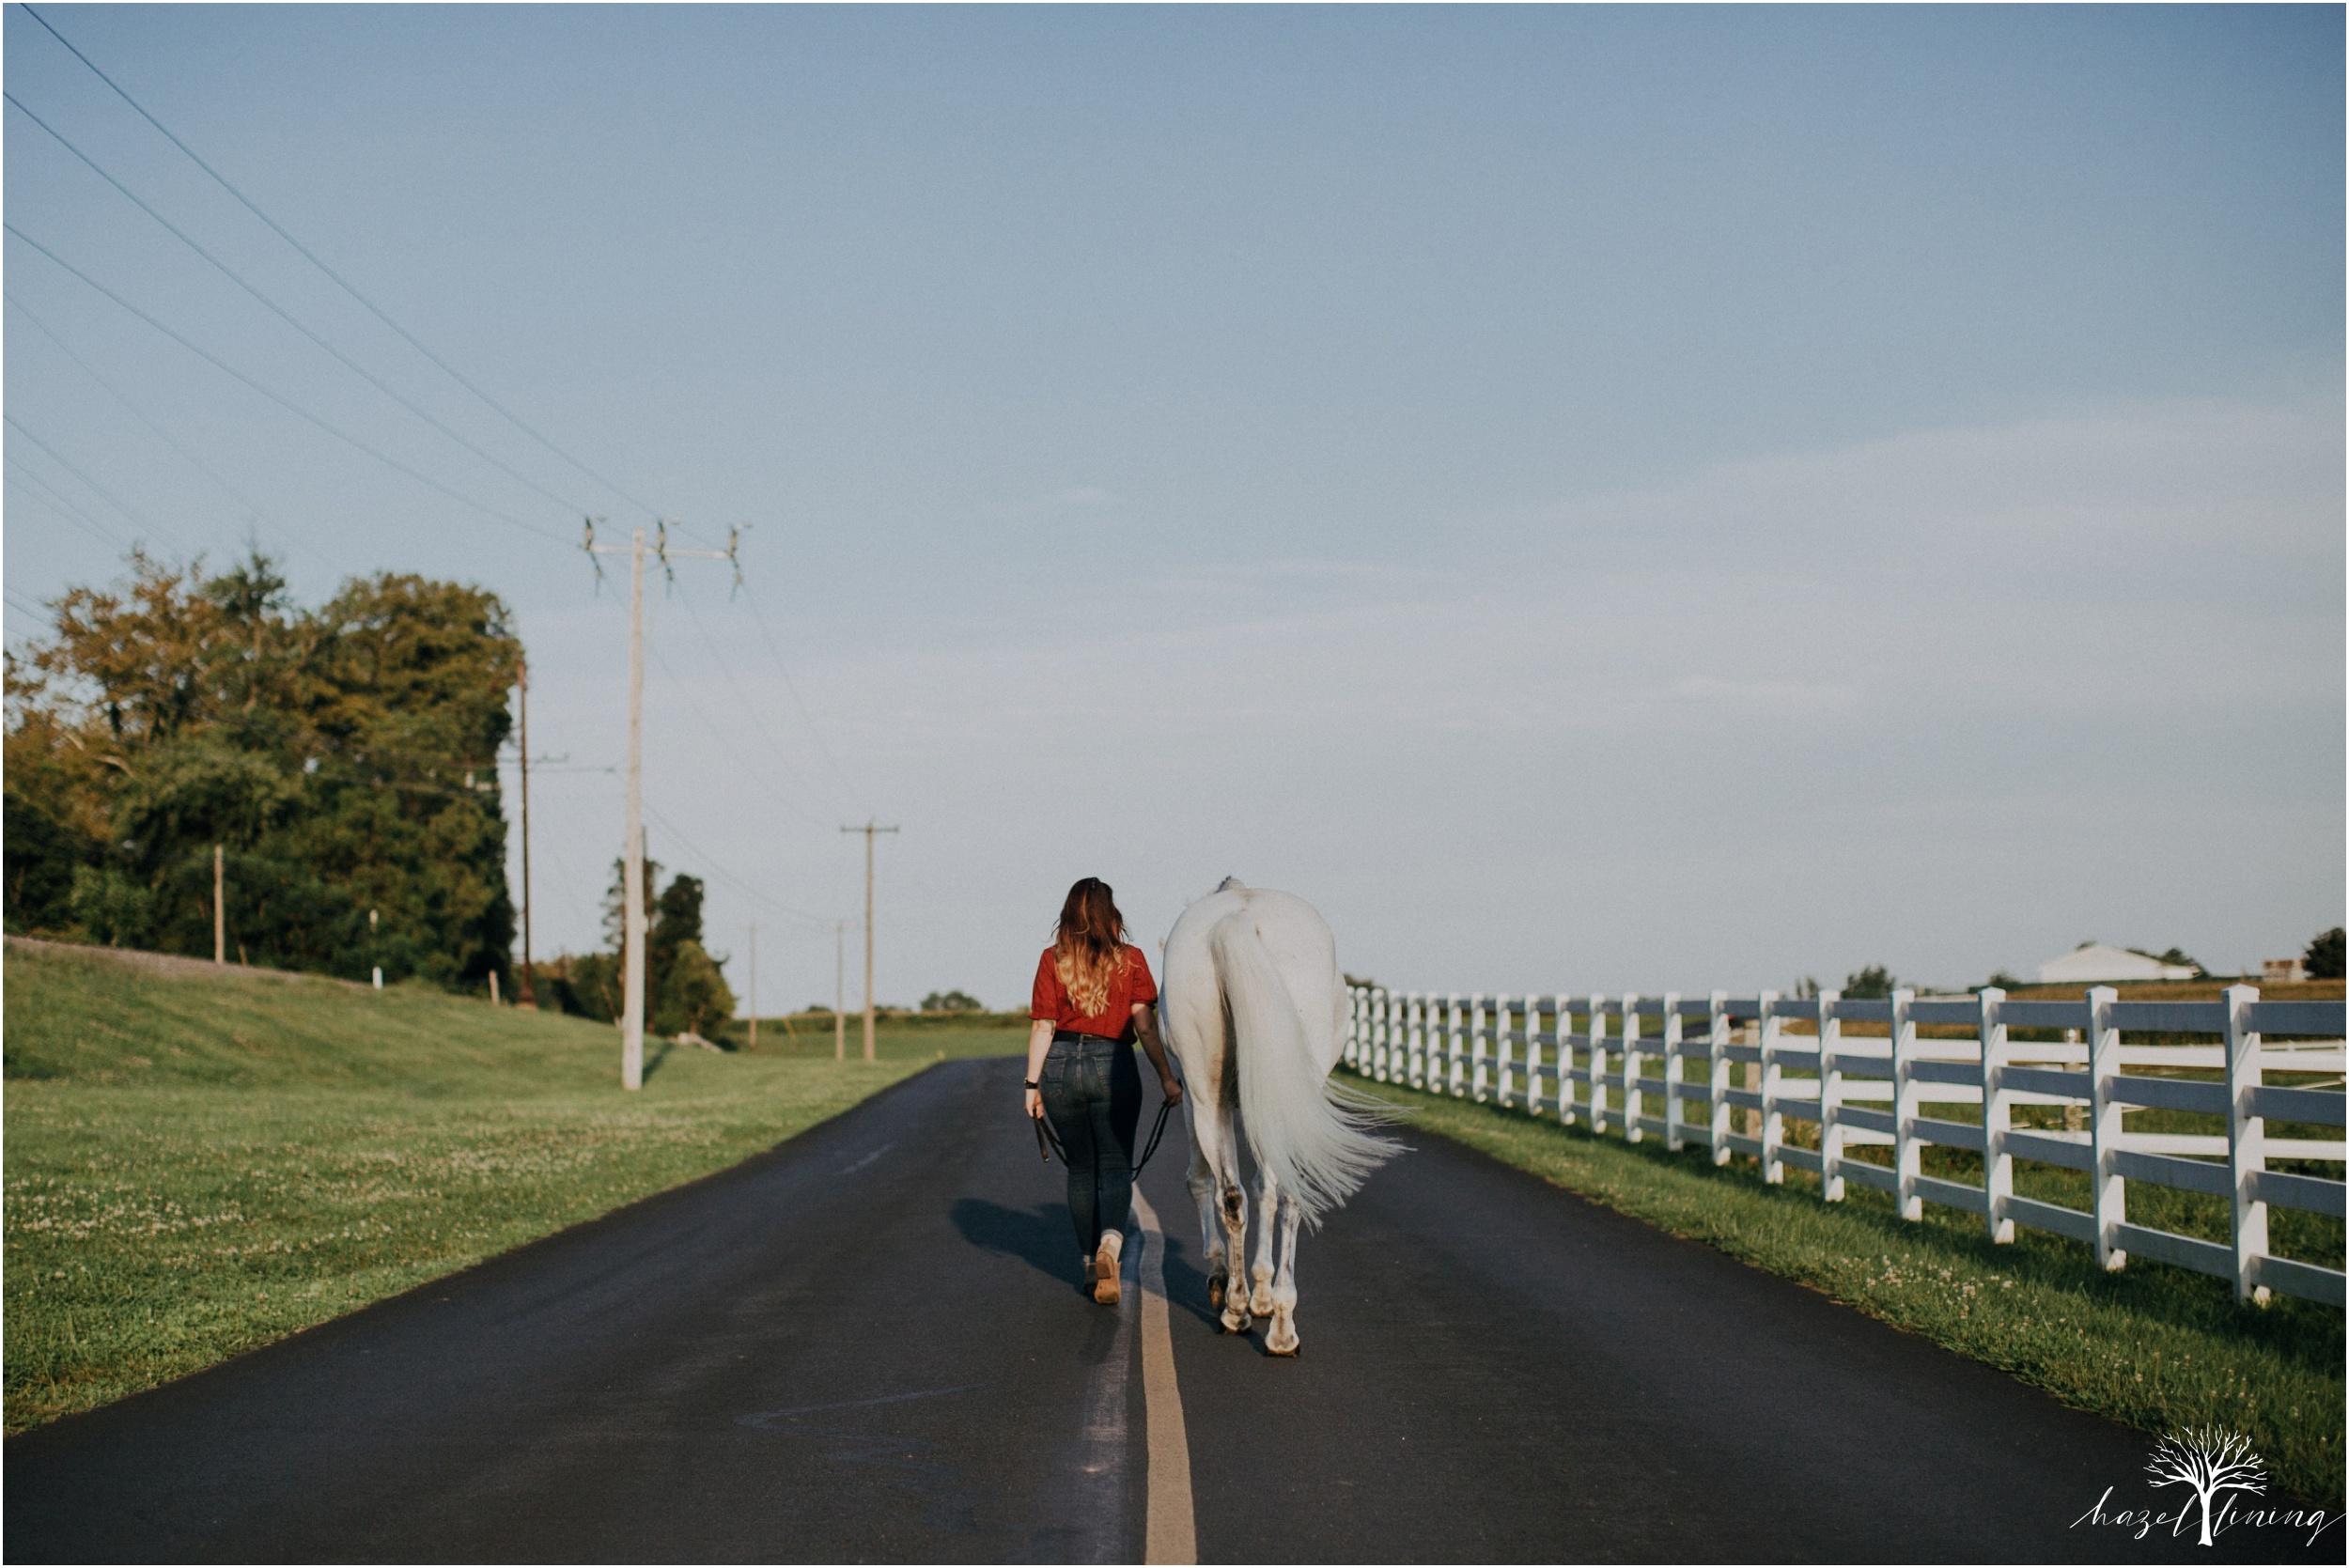 taylor-adams-and-horse-delaware-valley-university-delval-summer-equestrian-portrait-session-hazel-lining-photography-destination-elopement-wedding-engagement-photography_0020.jpg